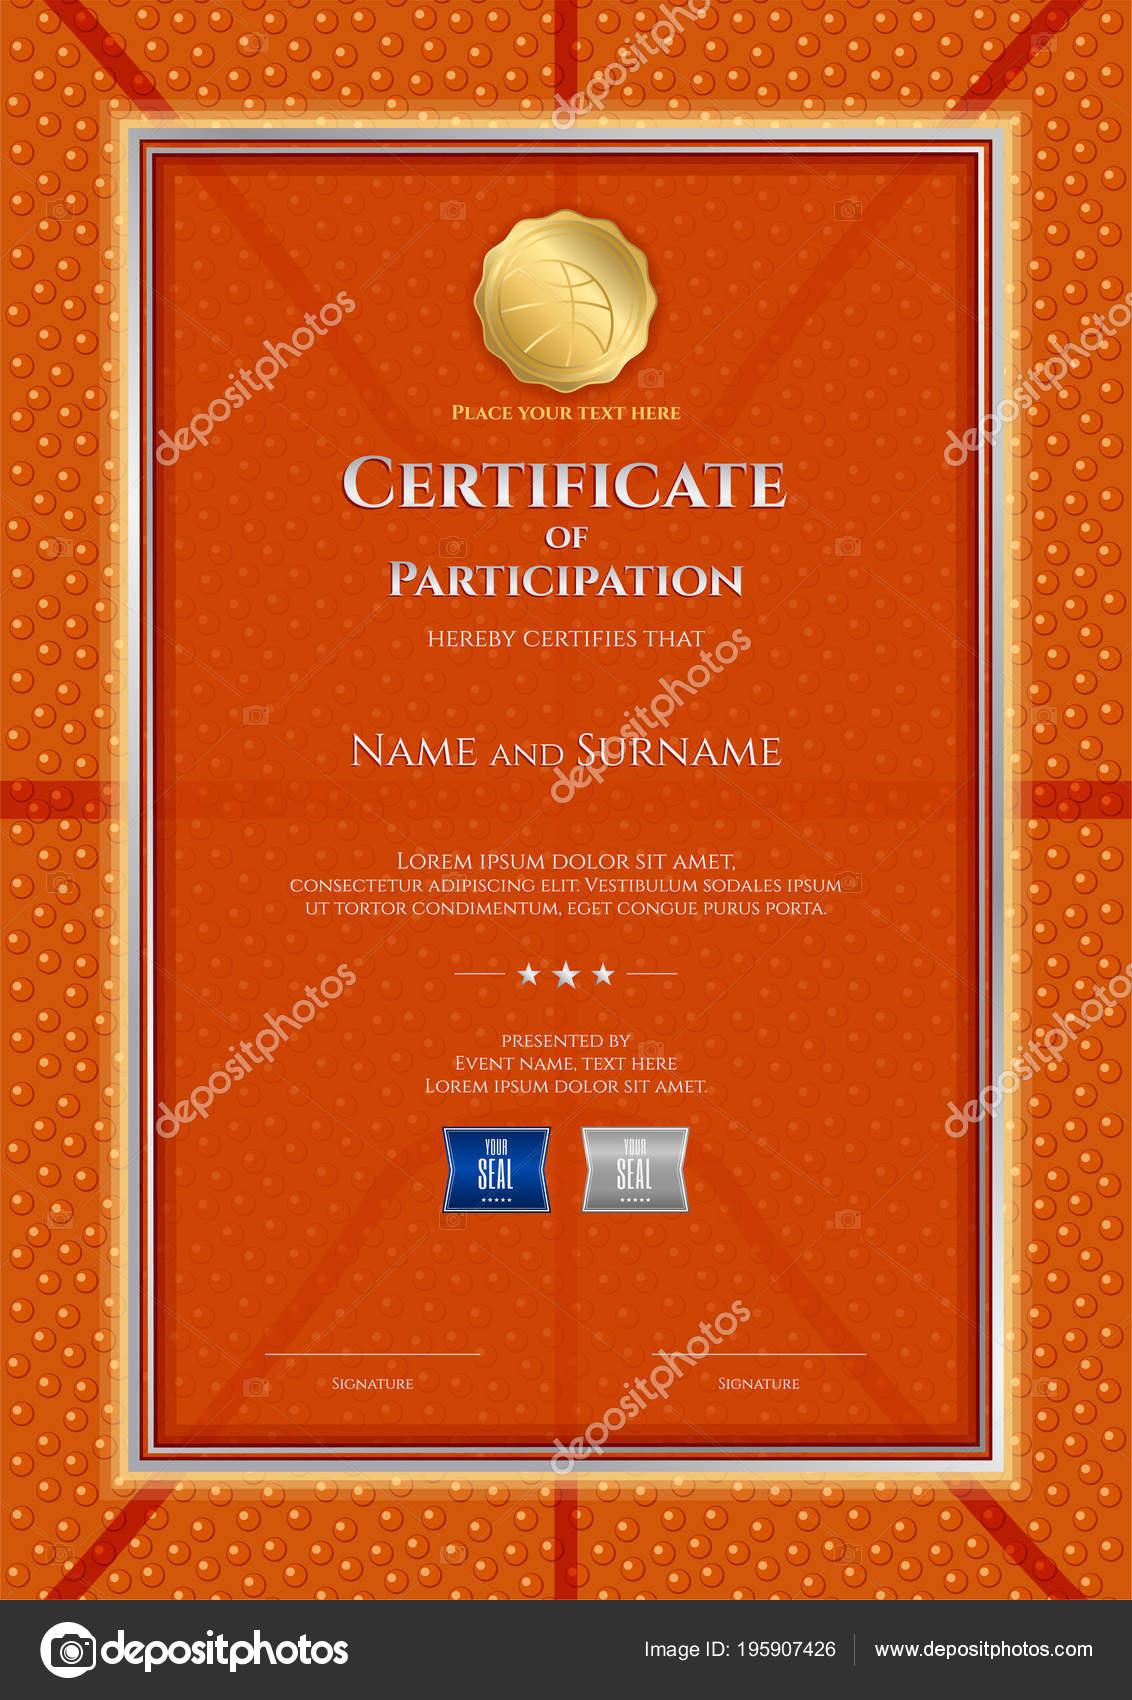 Portrait certificate template basketball sport theme ball.